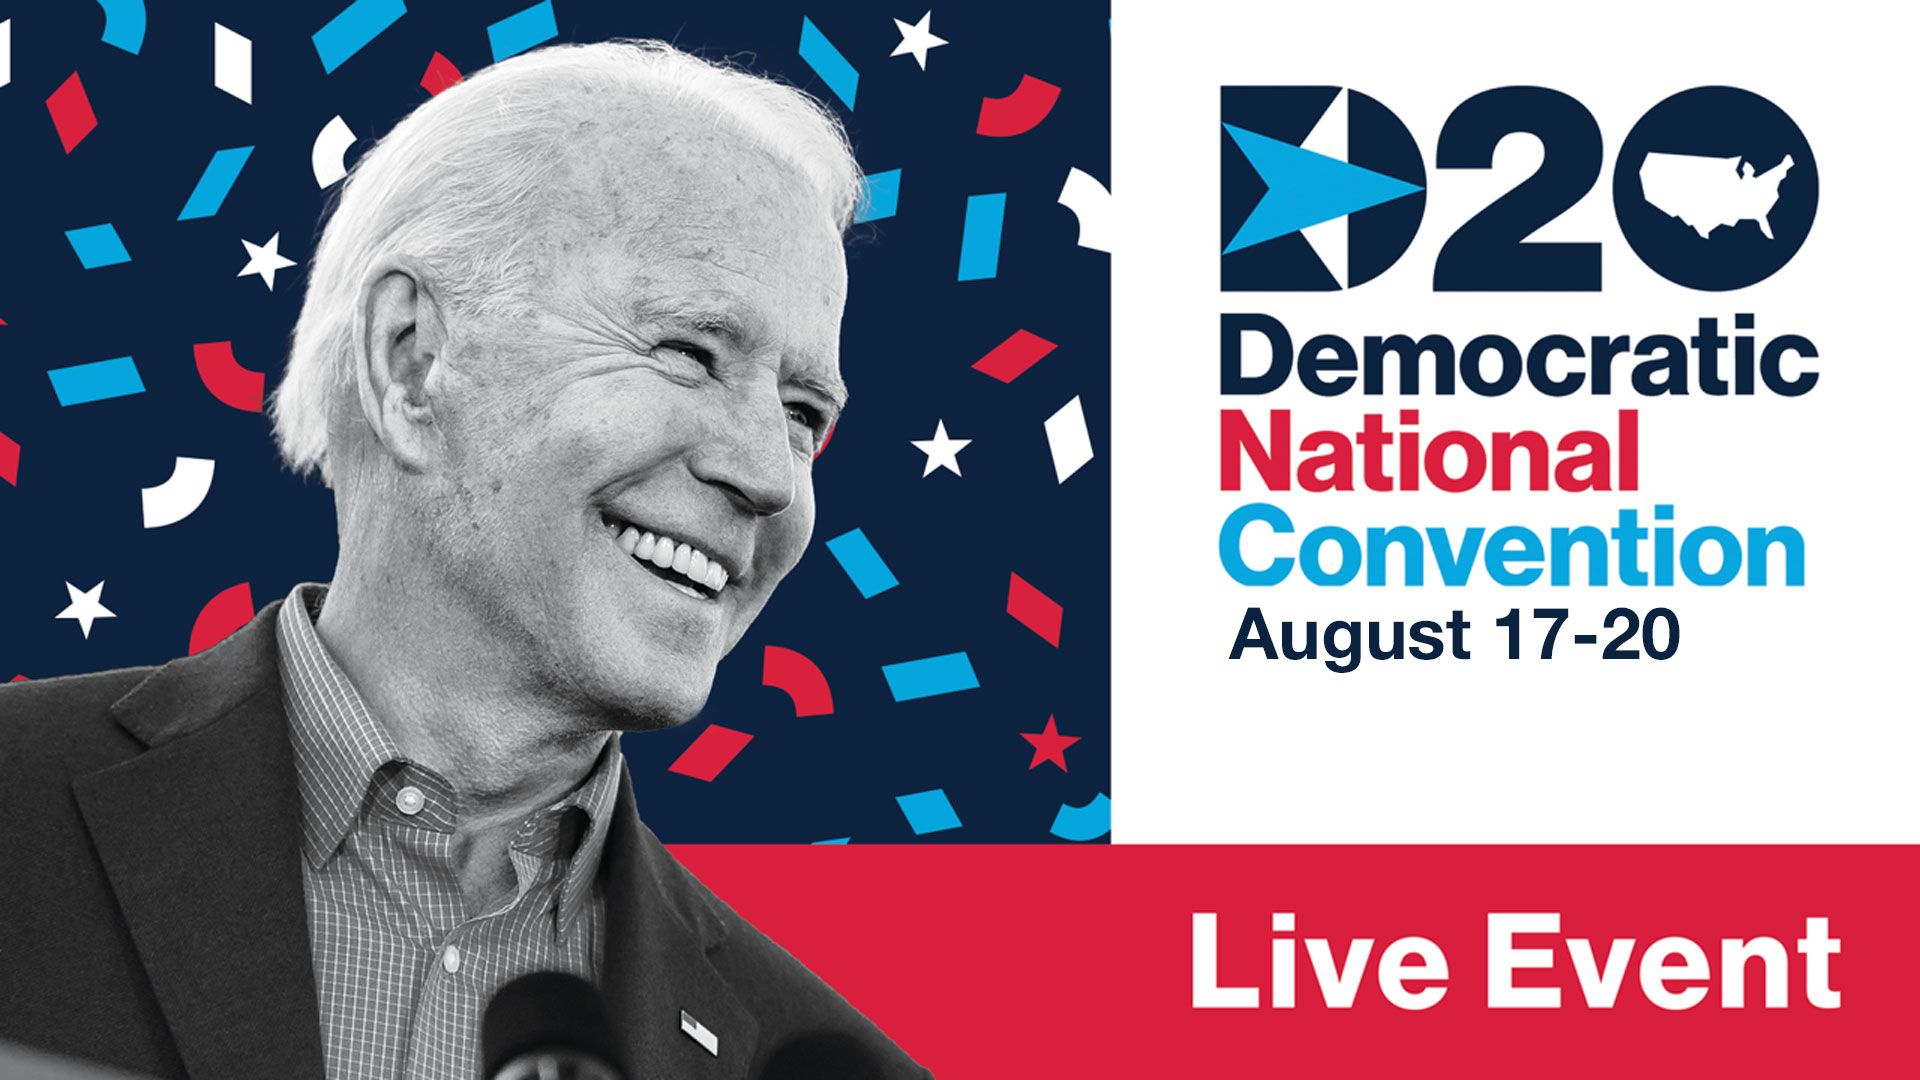 DNC-Live_Event.jpg